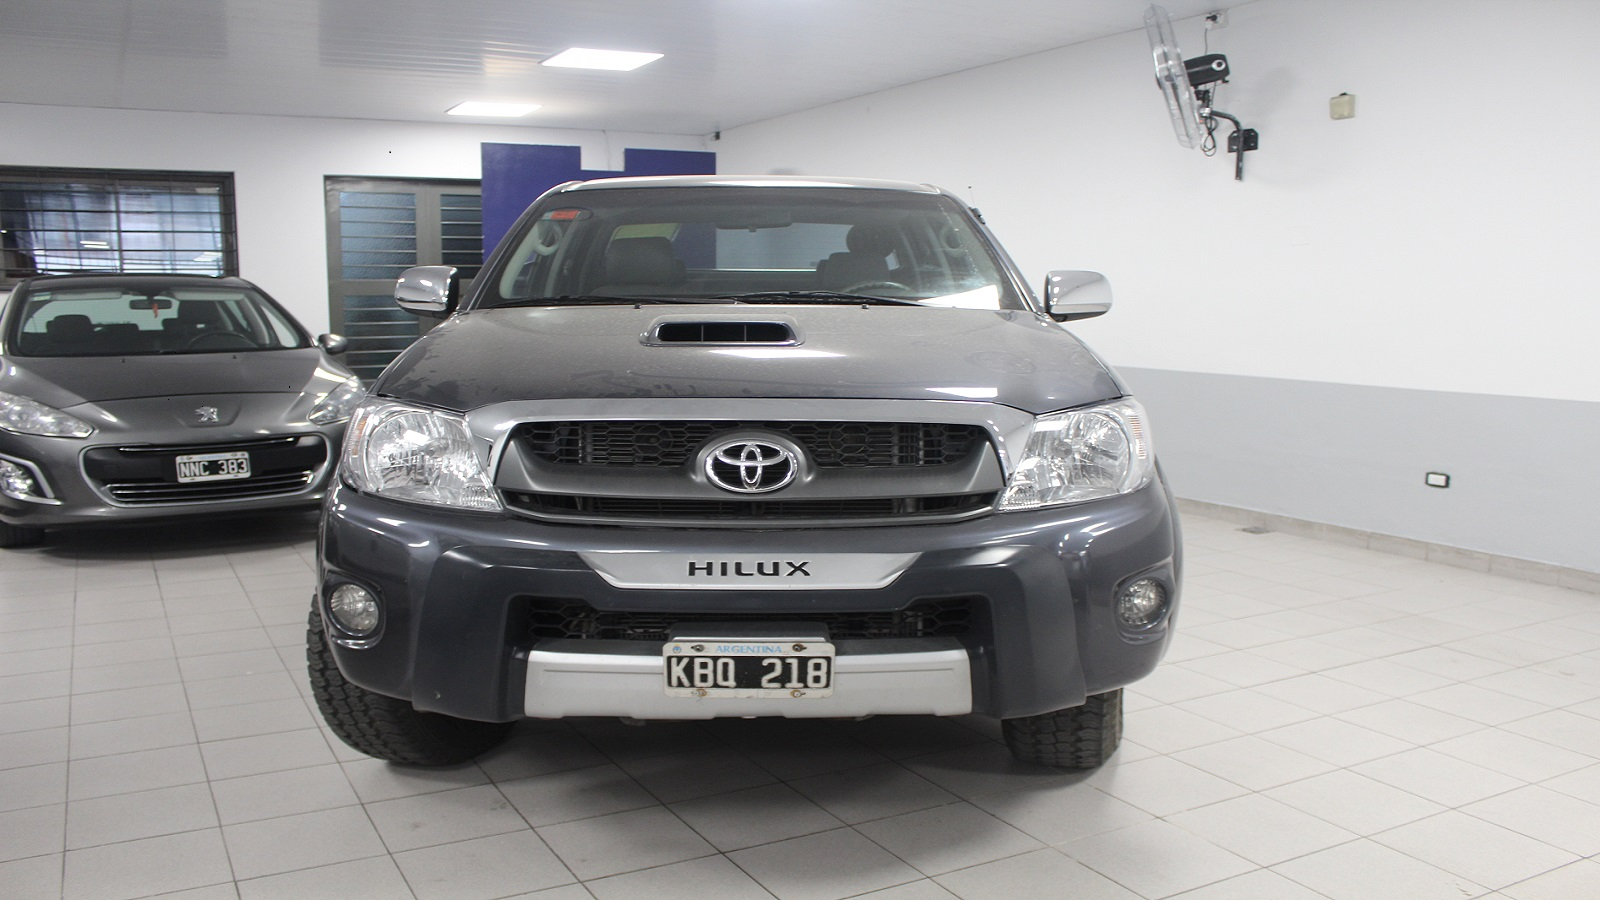 2011 Toyota Hilux SRV 3.0tdi